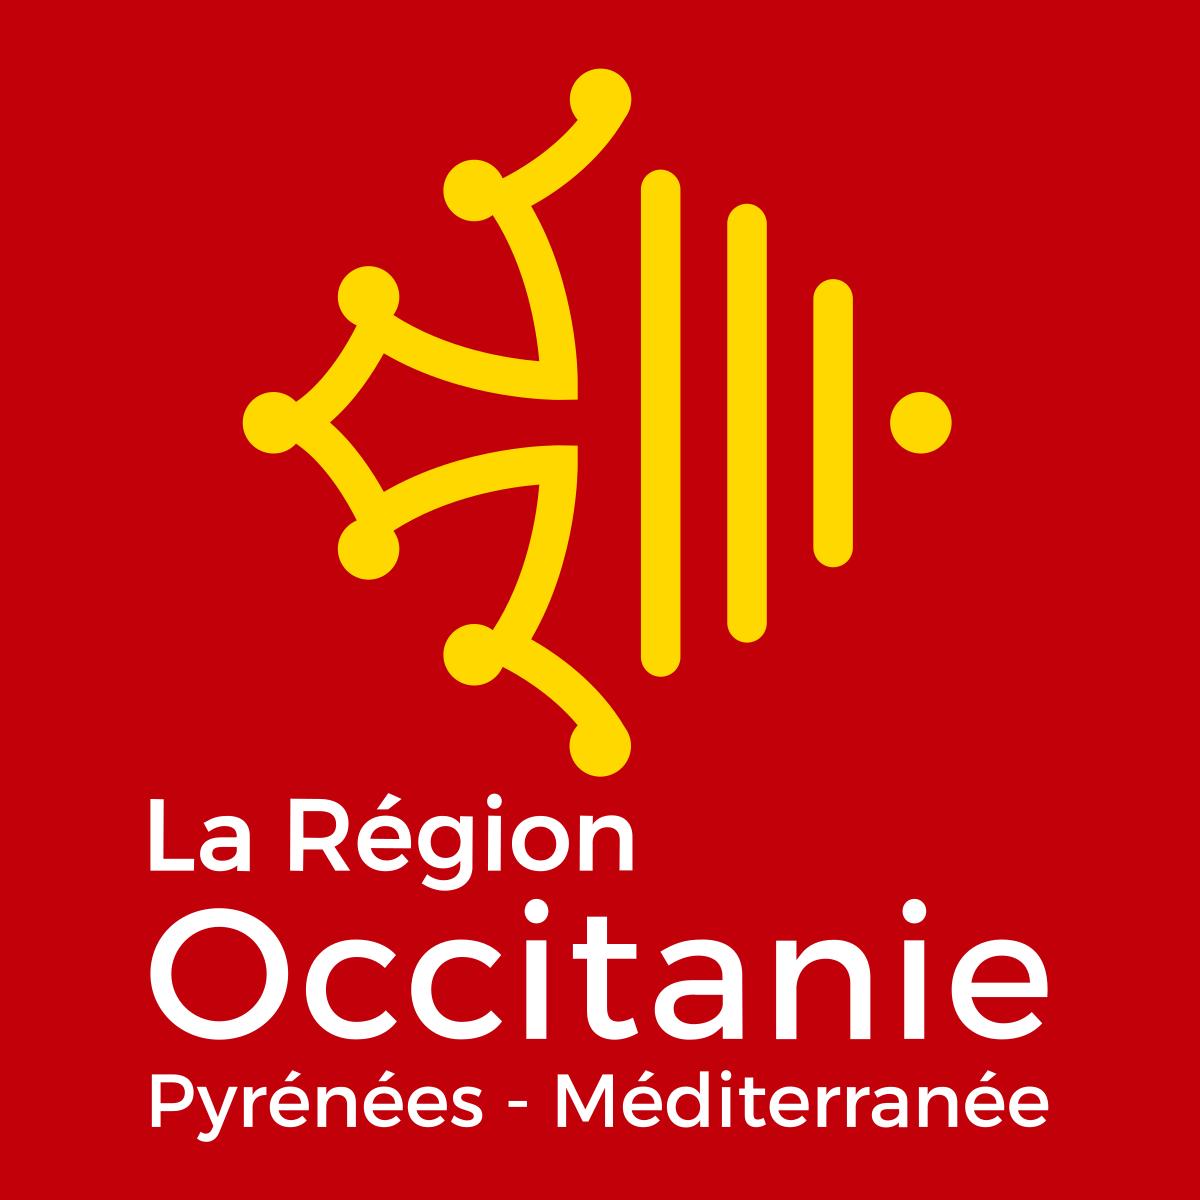 occitanie_region